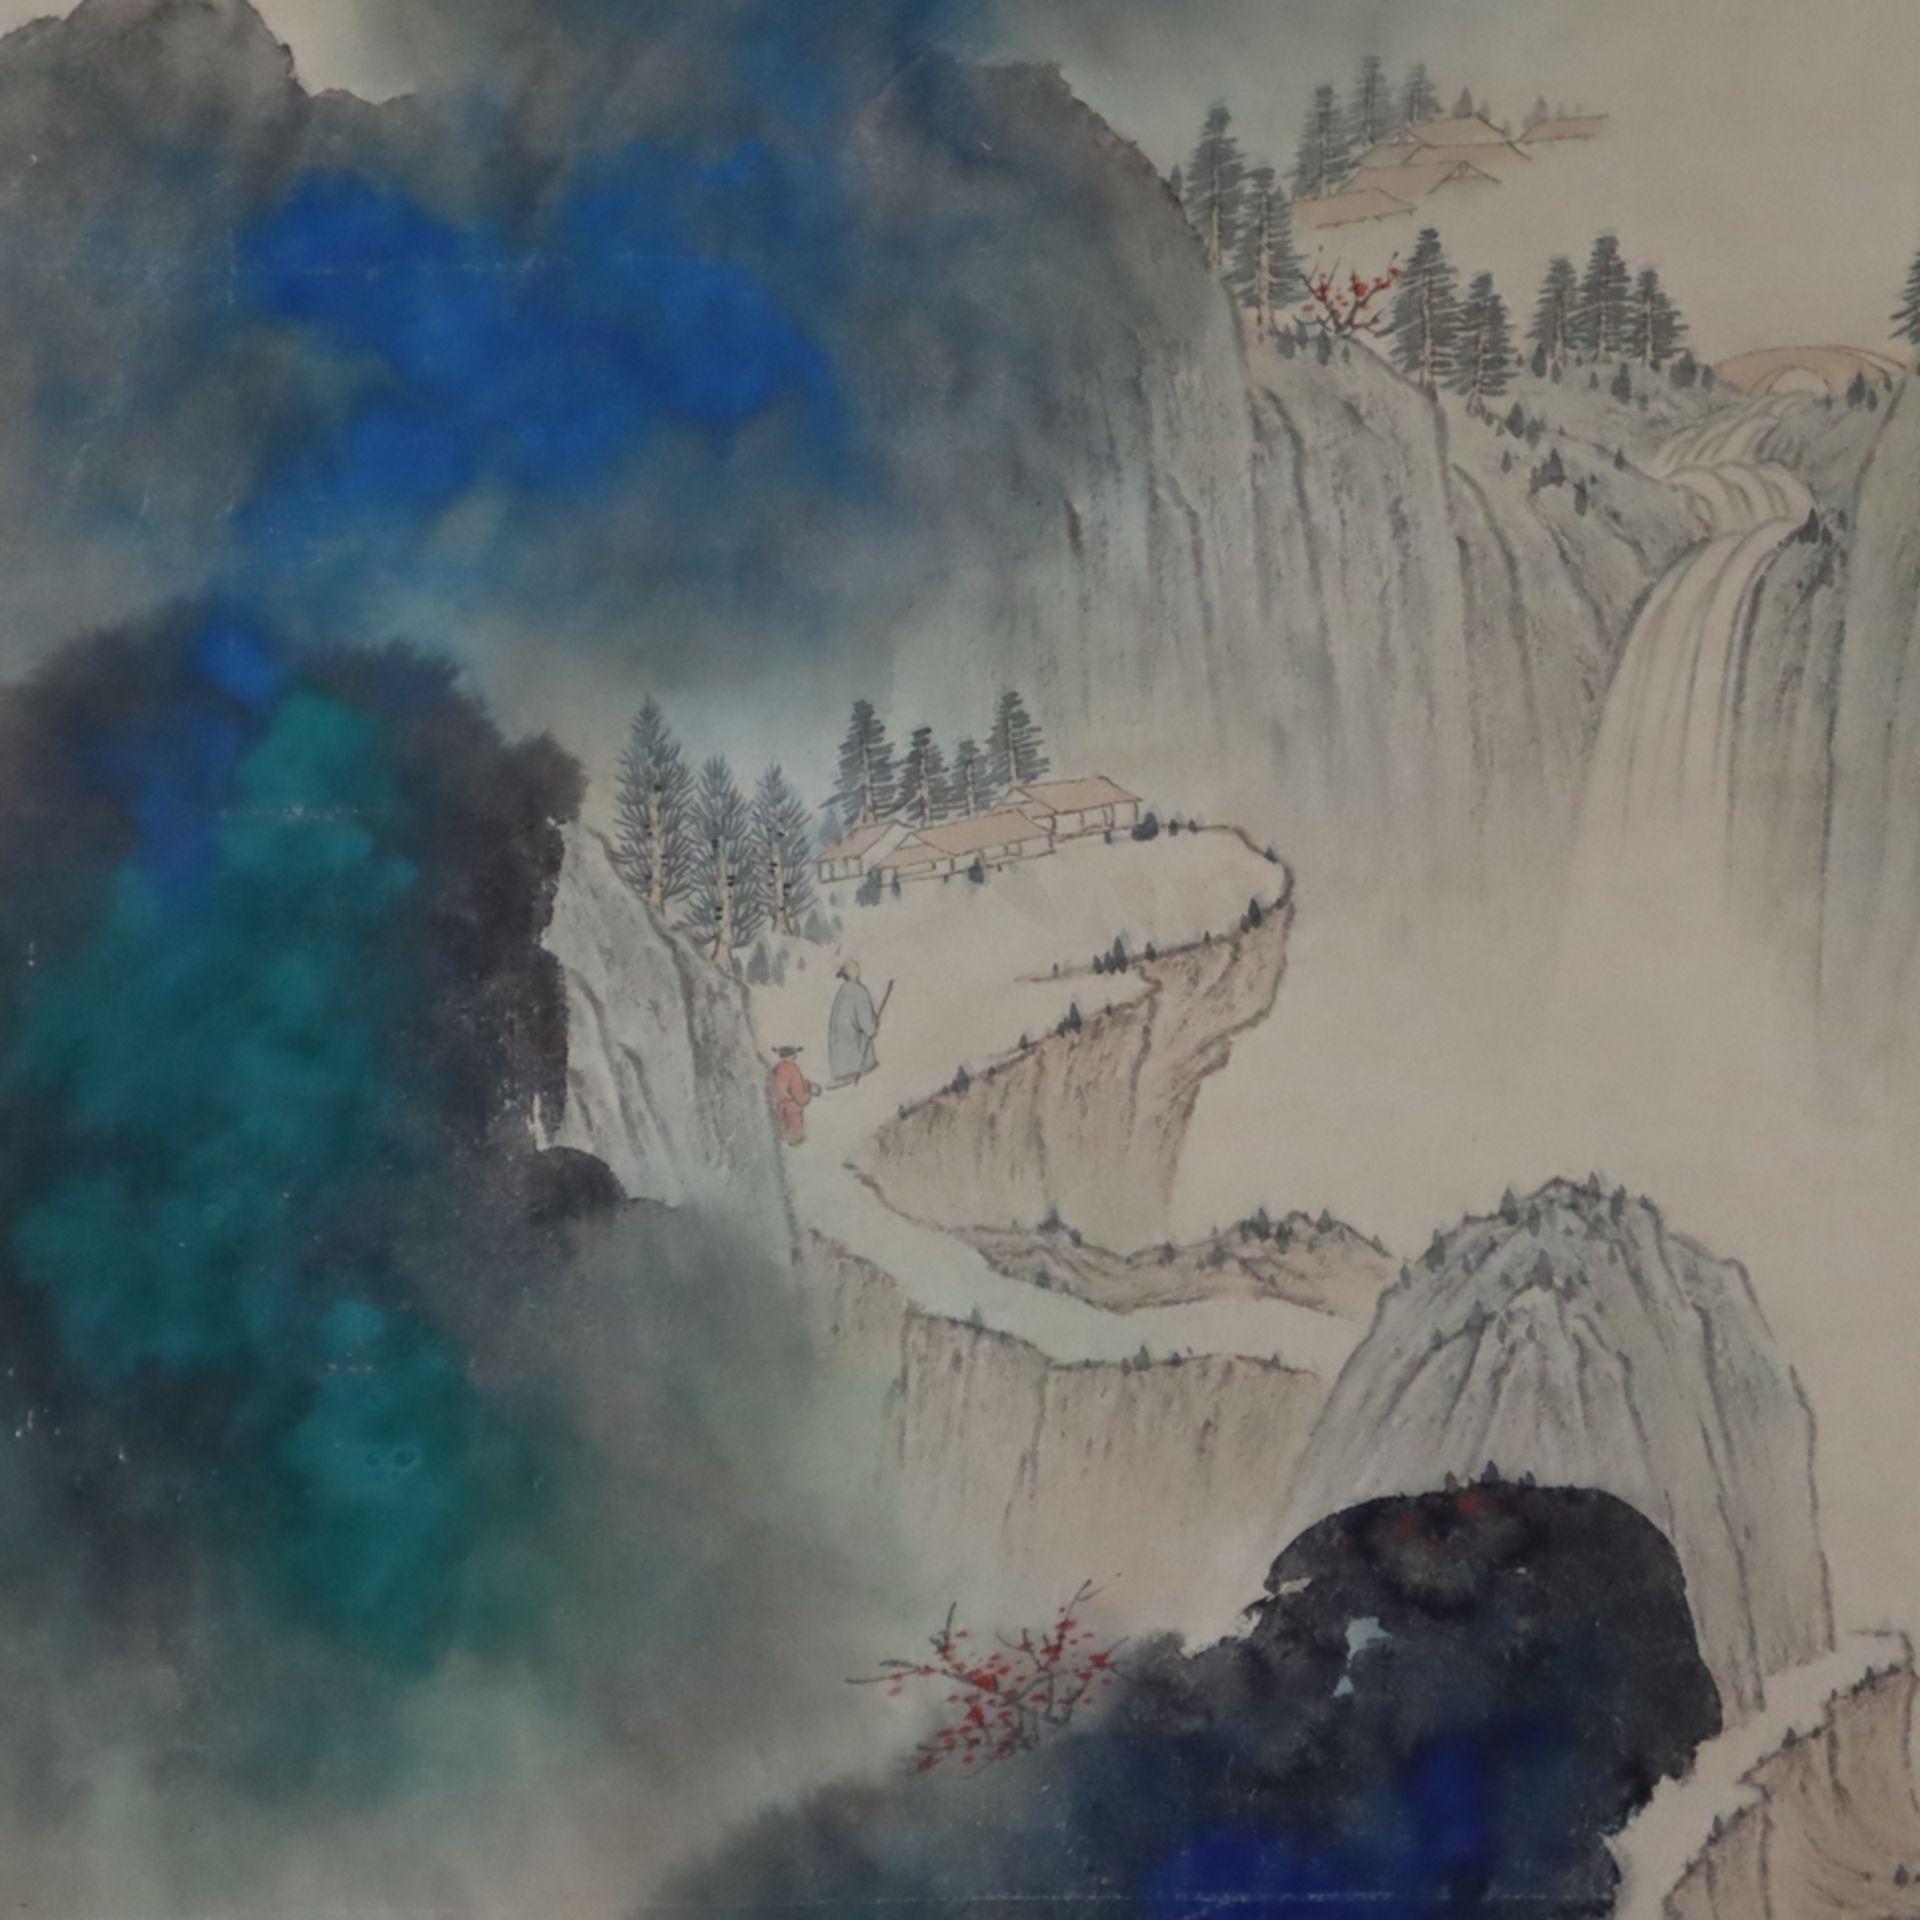 Chinesisches Rollbild - gesiegelt Zhang Daqian (   Chinese Hanging Scroll - sealed Zhang Daqian (18 - Image 3 of 18